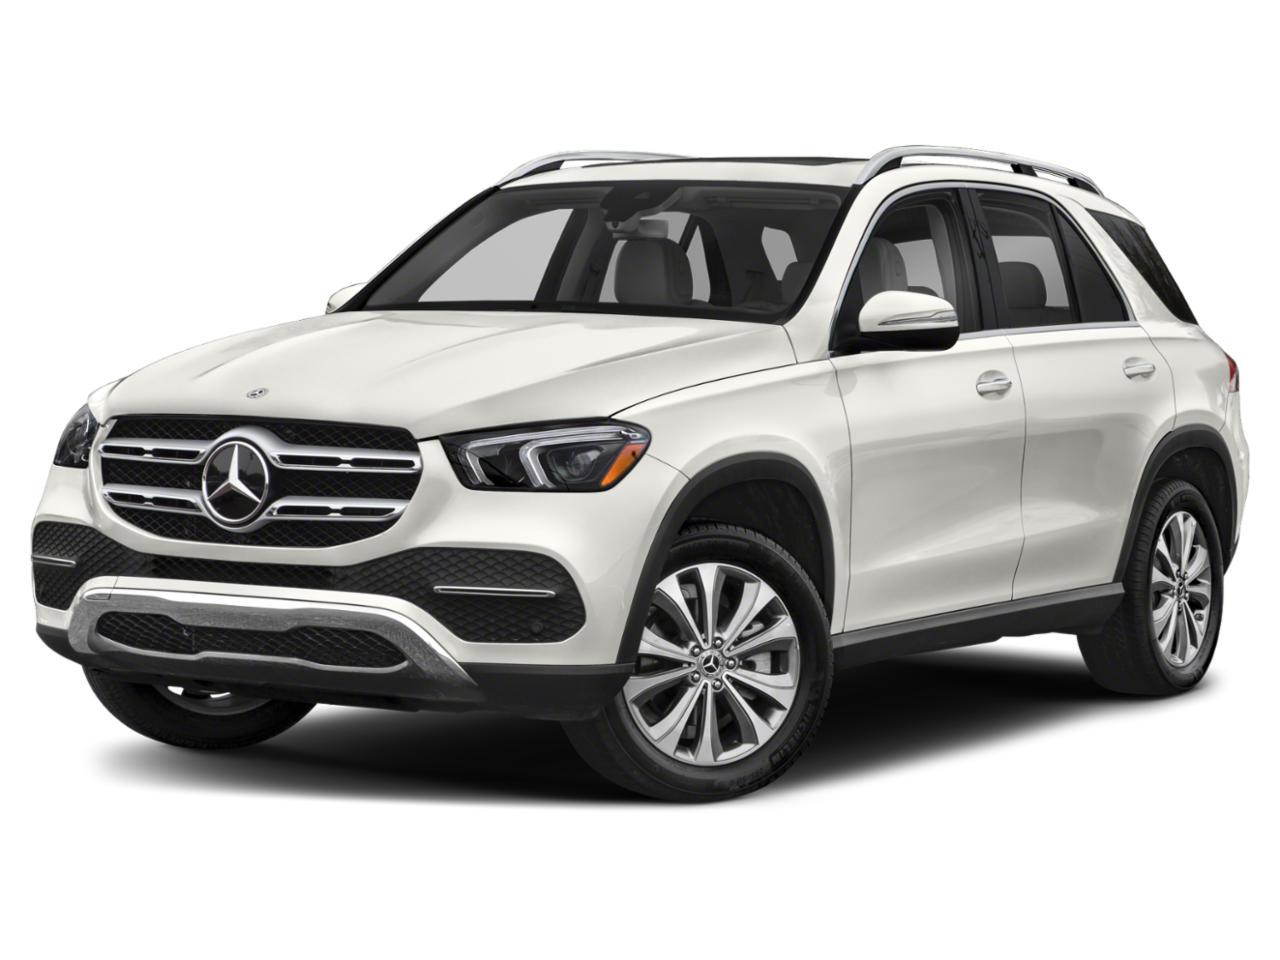 2021 Mercedes-Benz GLE Vehicle Photo in Appleton, WI 54913